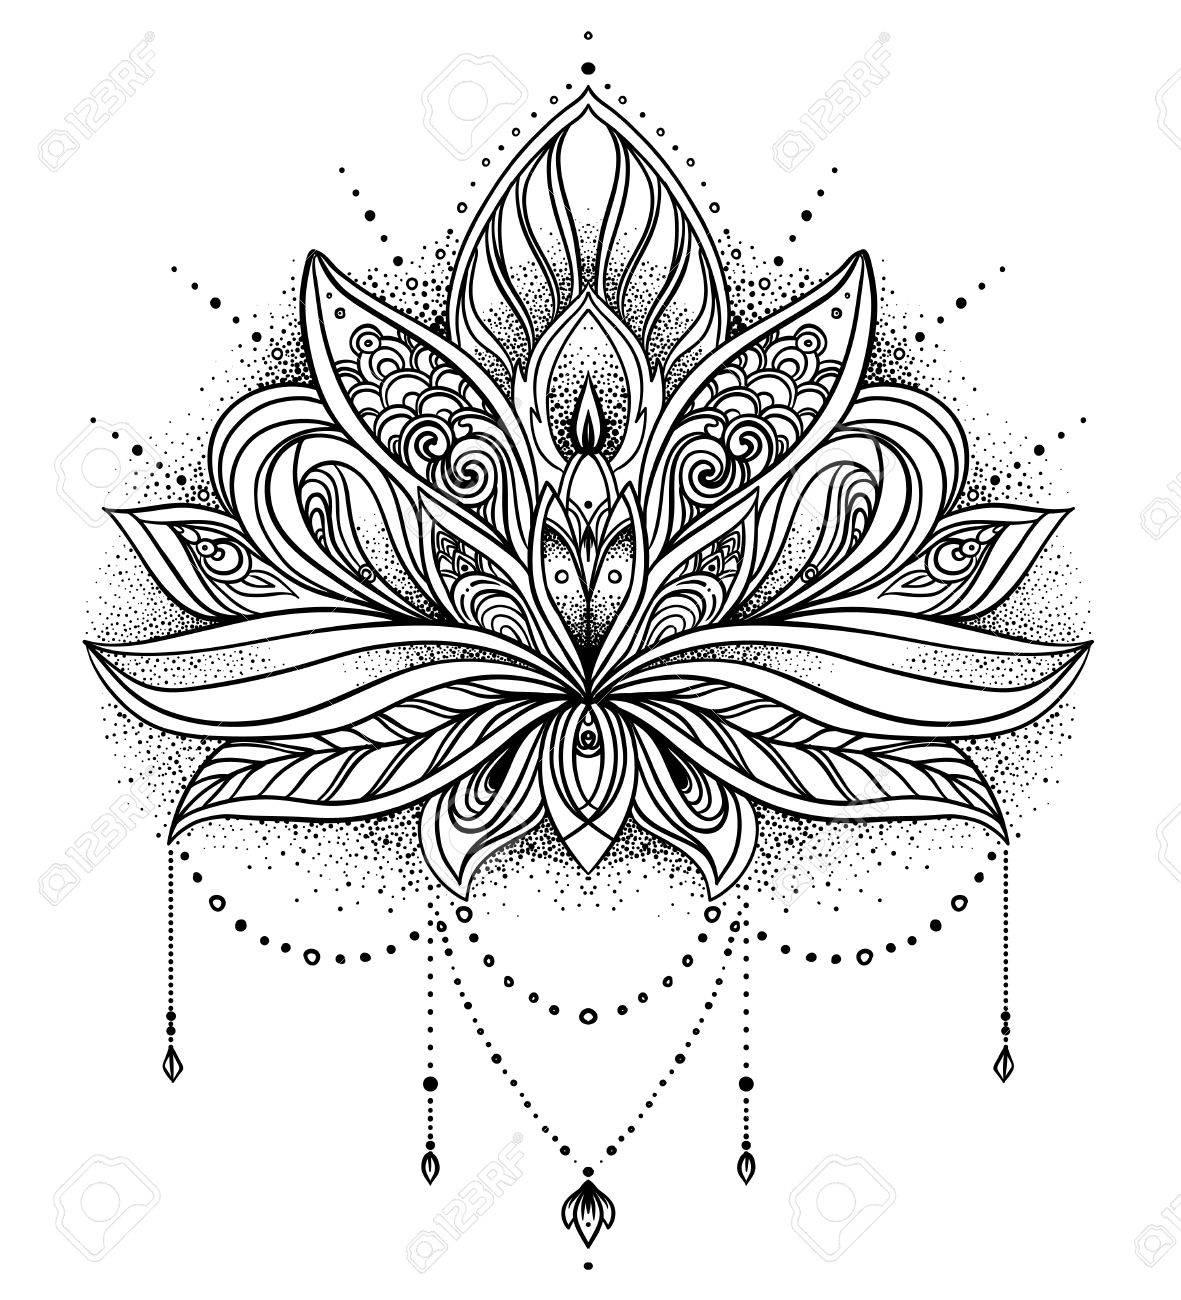 Vector ornamental Lotus flower, ethnic art, patterned Indian paisley. Hand drawn illustration. Invitation element. Tattoo, astrology, alchemy, boho and magic symbol. - 79141104